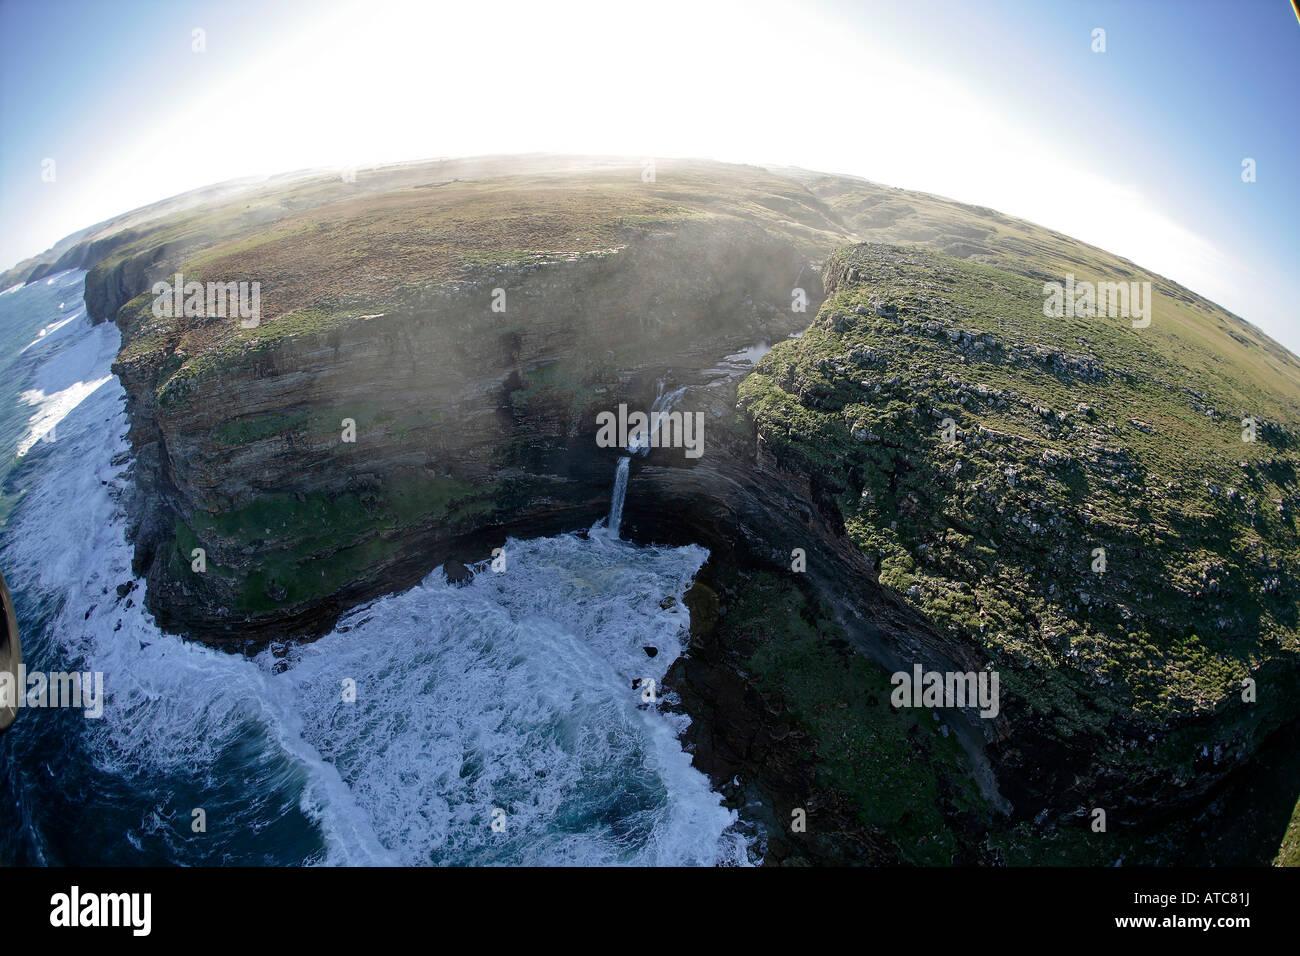 aerial view of sandstone coastline of Wild Coast Transkei Southeast Africa Indian Ocean Mozambique - Stock Image